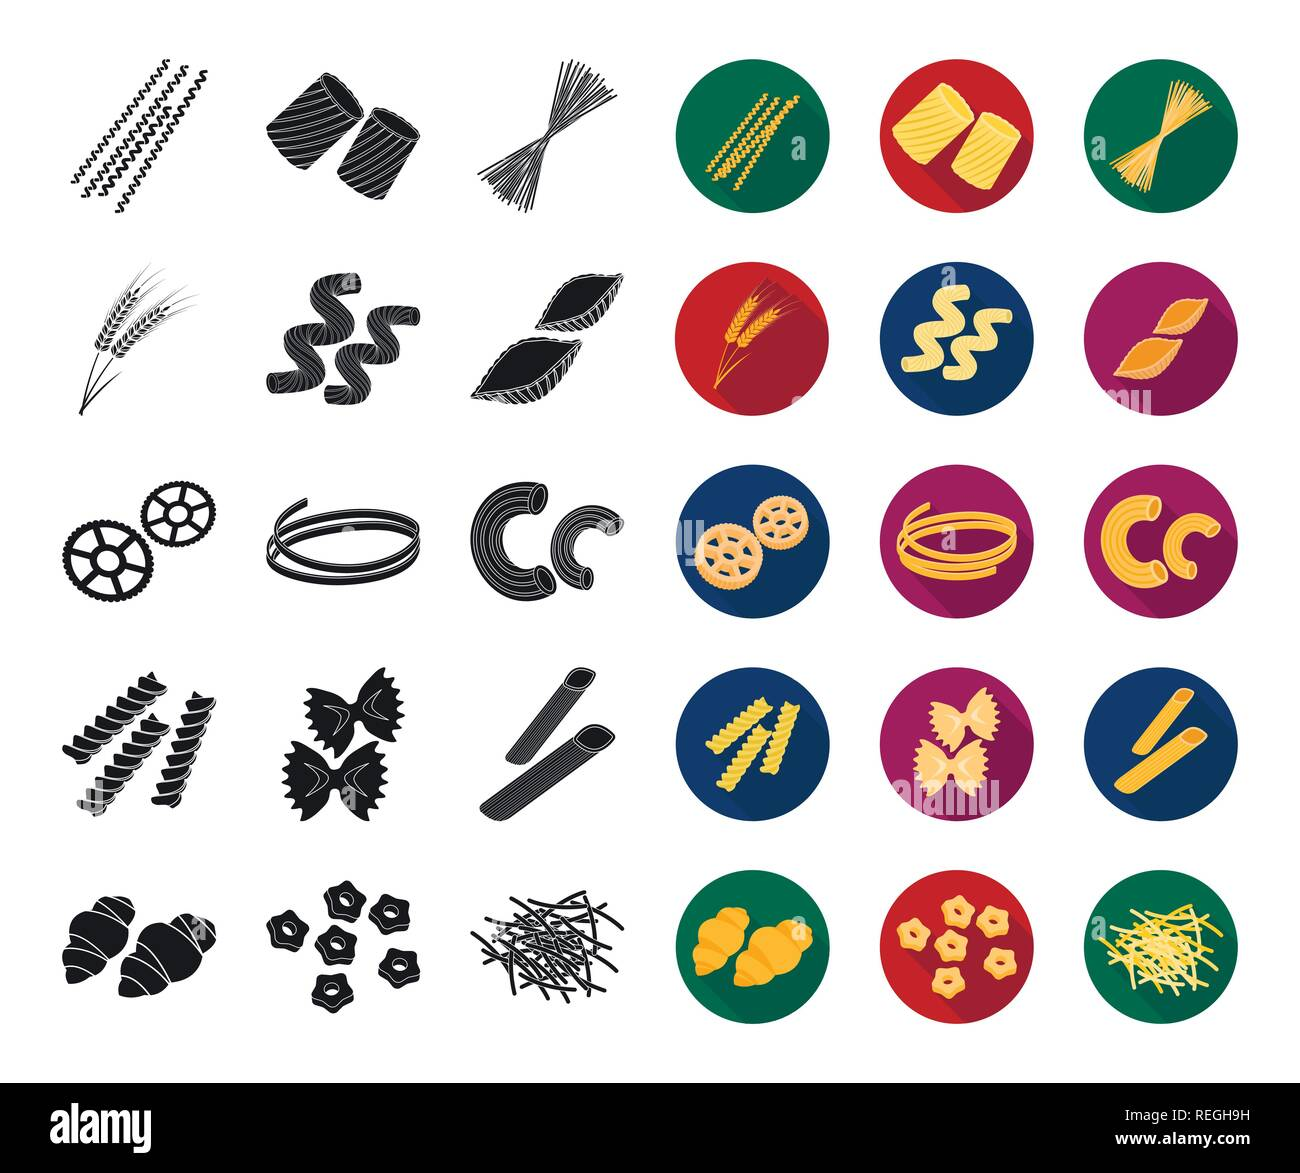 art,black,flat,bucati,carbohydrate,cavatappi,cereal,chifferi,collection,conchiglie,design,ditalini,dough,ears,farfalle,figured,filini,food,fusilli,gnocchi,icon,illustration,isolated,logo,macaroni,pasta,penne,product,ravioli,rigate,rotelle,set,shape,sign,spaghetti,stelline,symbol,tagliatelle,types,vector,web,wheat Vector Vectors , Stock Vector